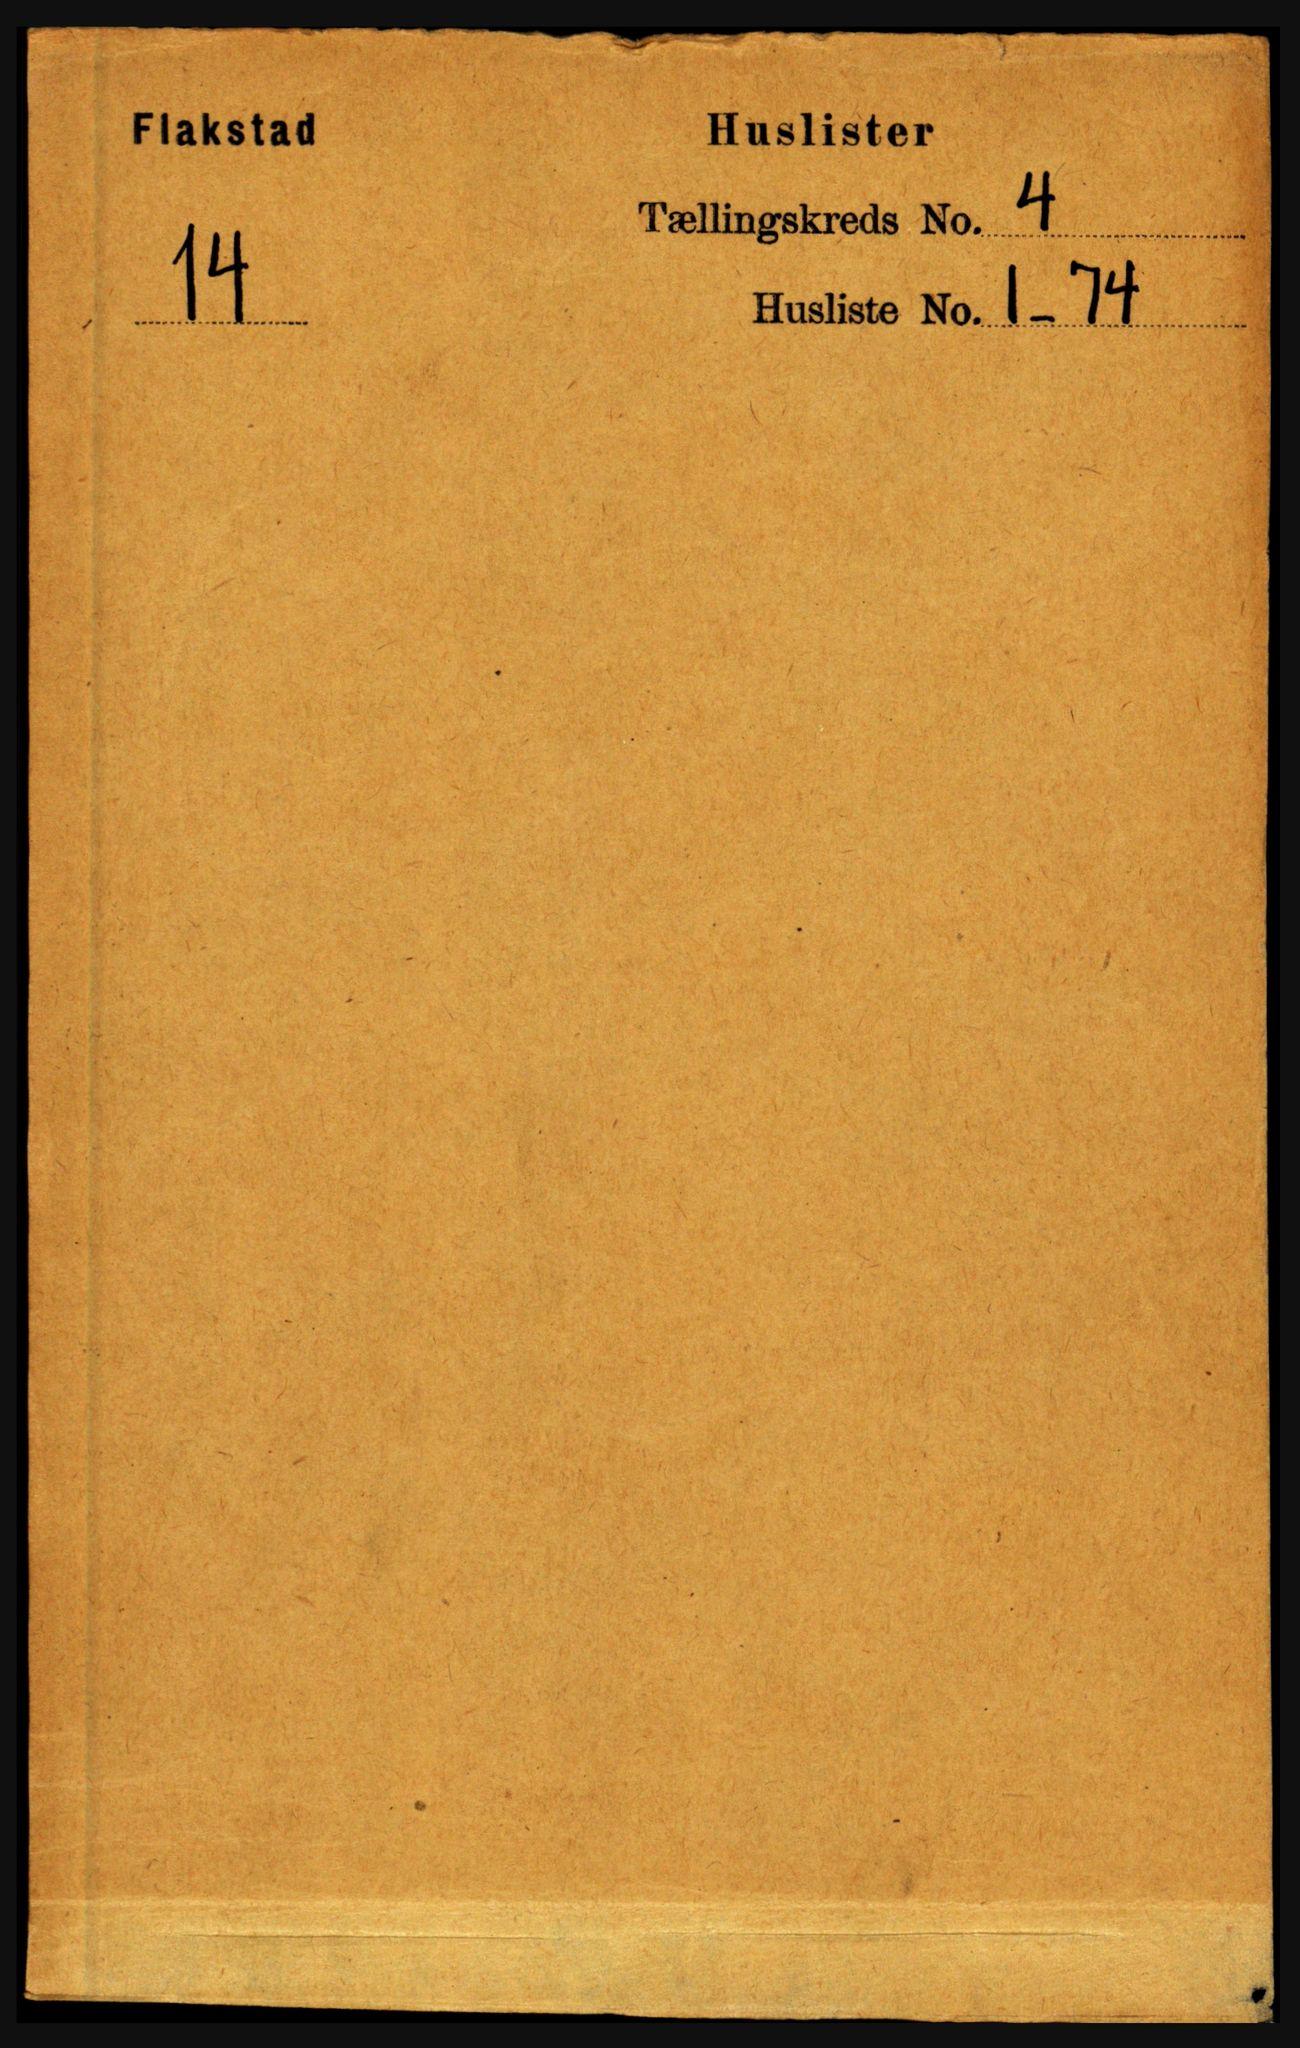 RA, Folketelling 1891 for 1859 Flakstad herred, 1891, s. 1784